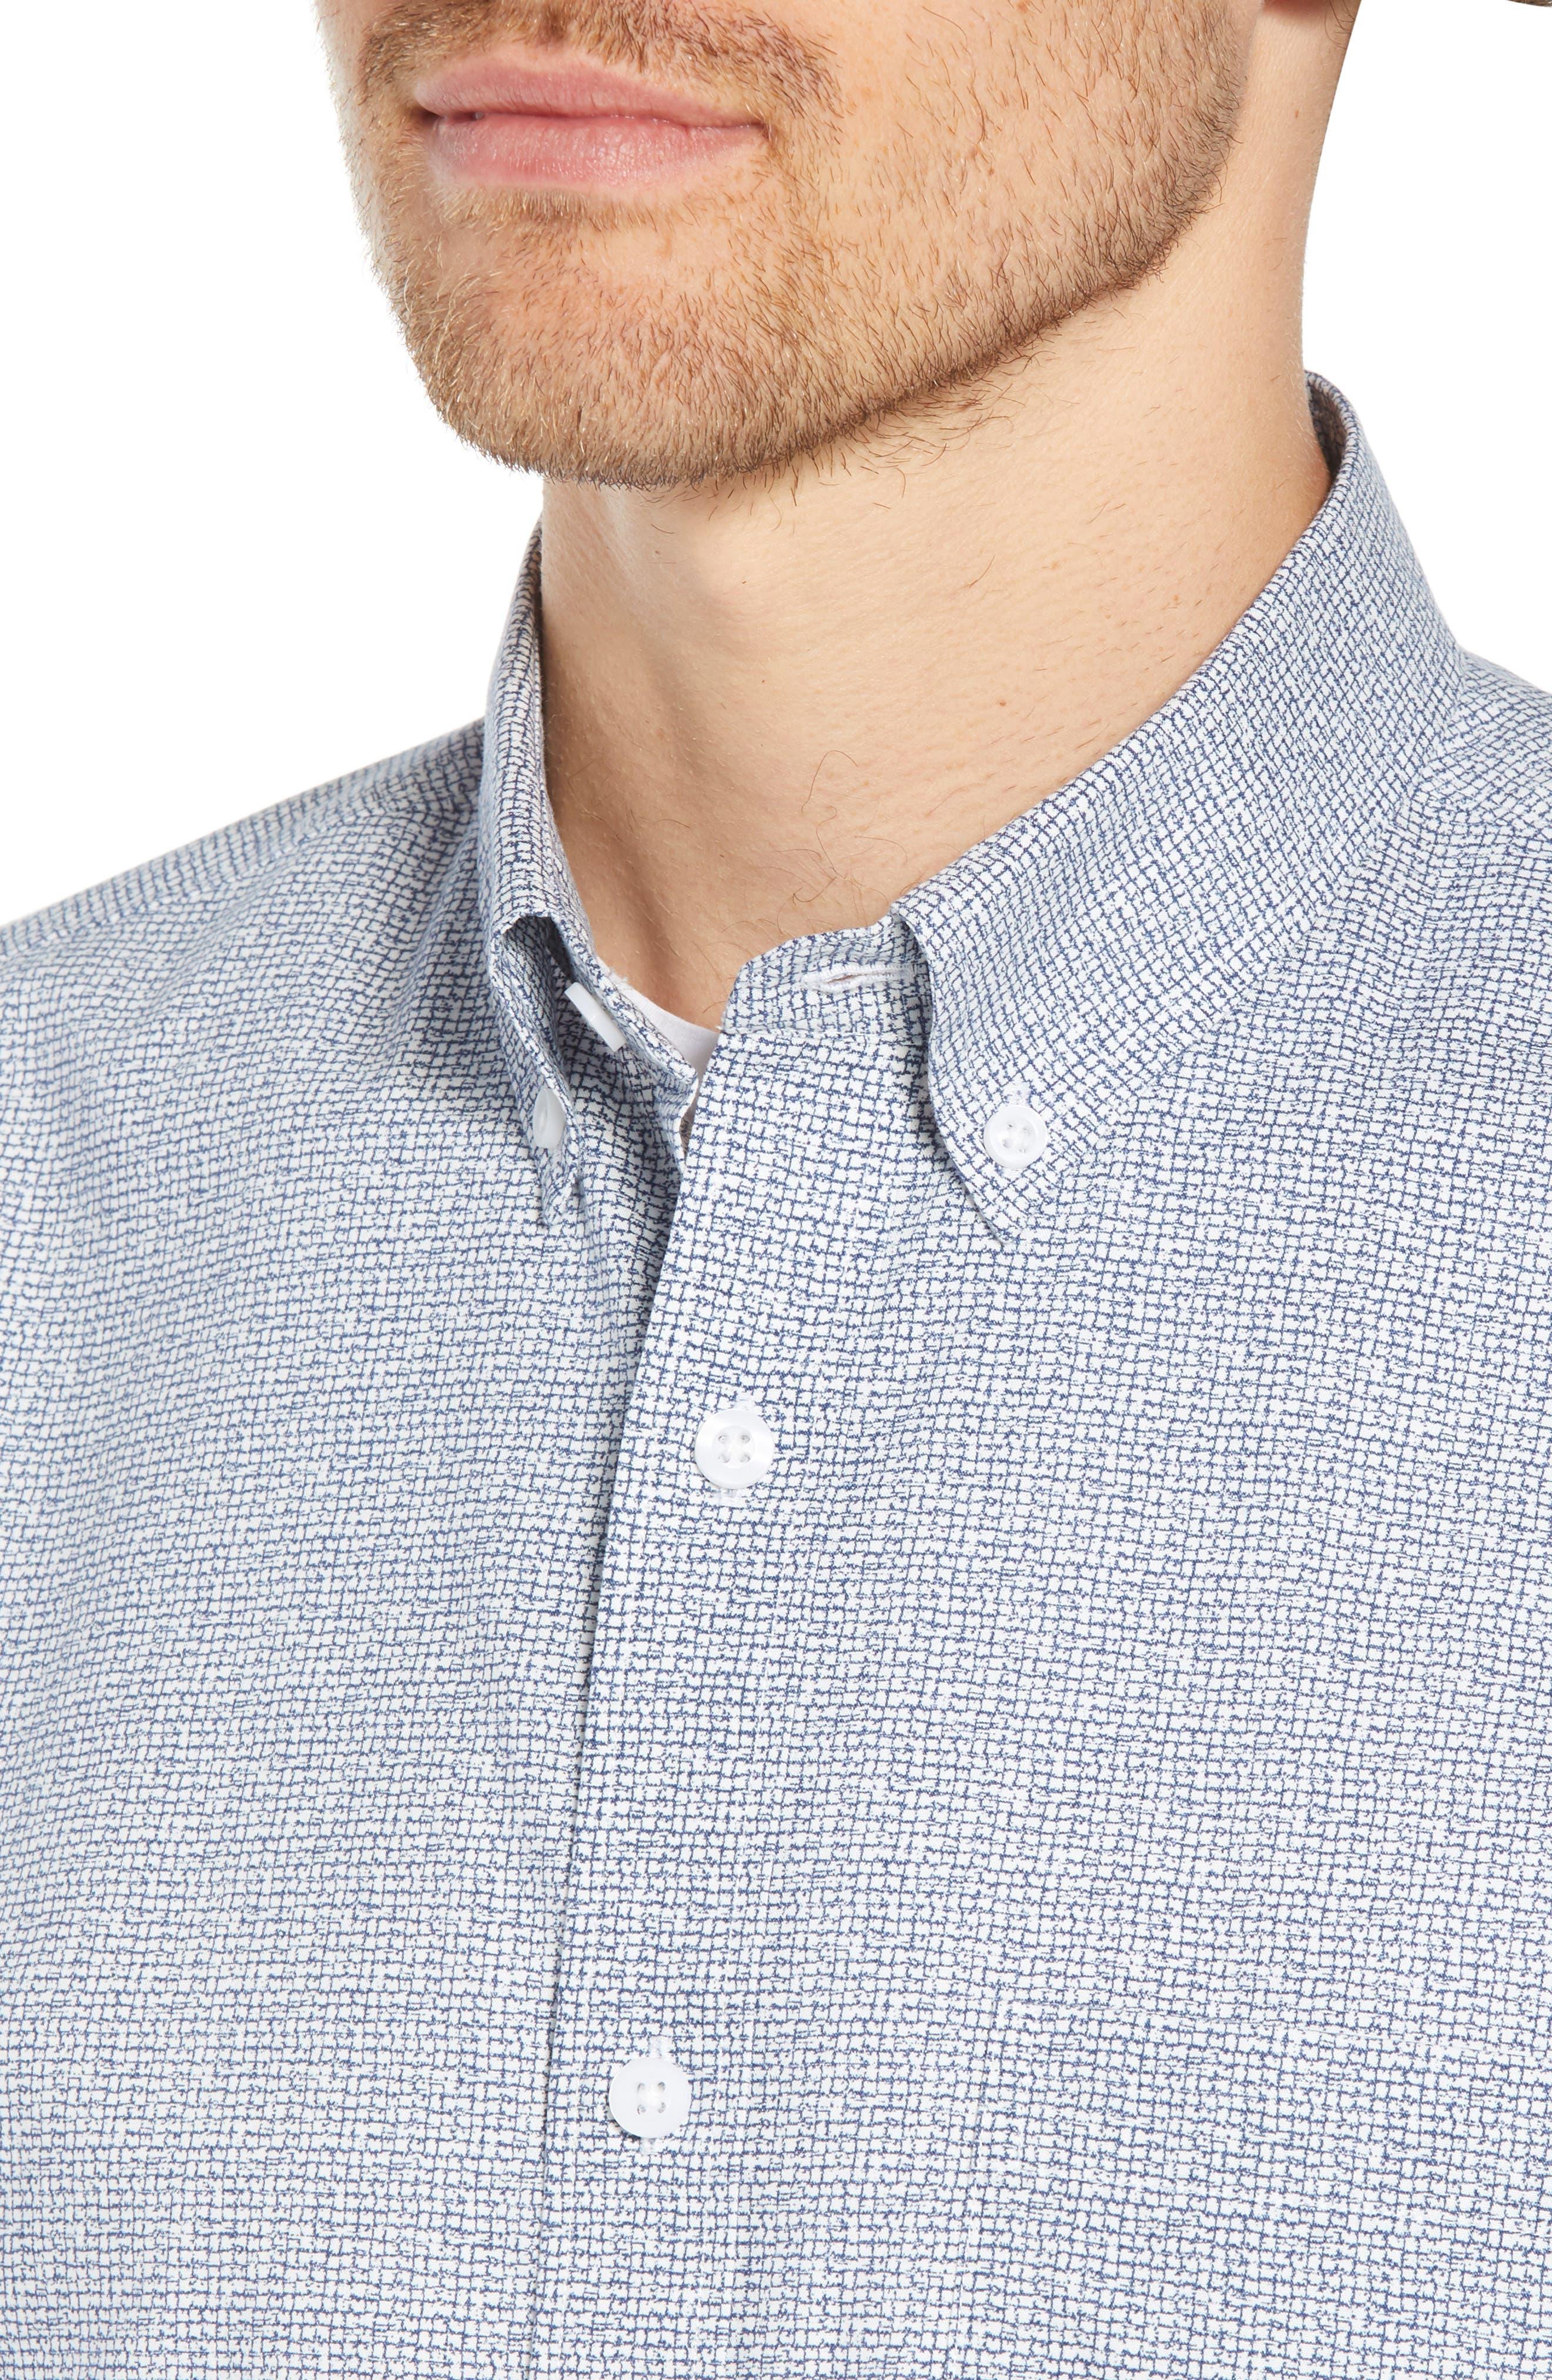 Ivy Trim Fit Print Sport Shirt,                             Alternate thumbnail 4, color,                             NAVY IRIS TEXTURED GRID